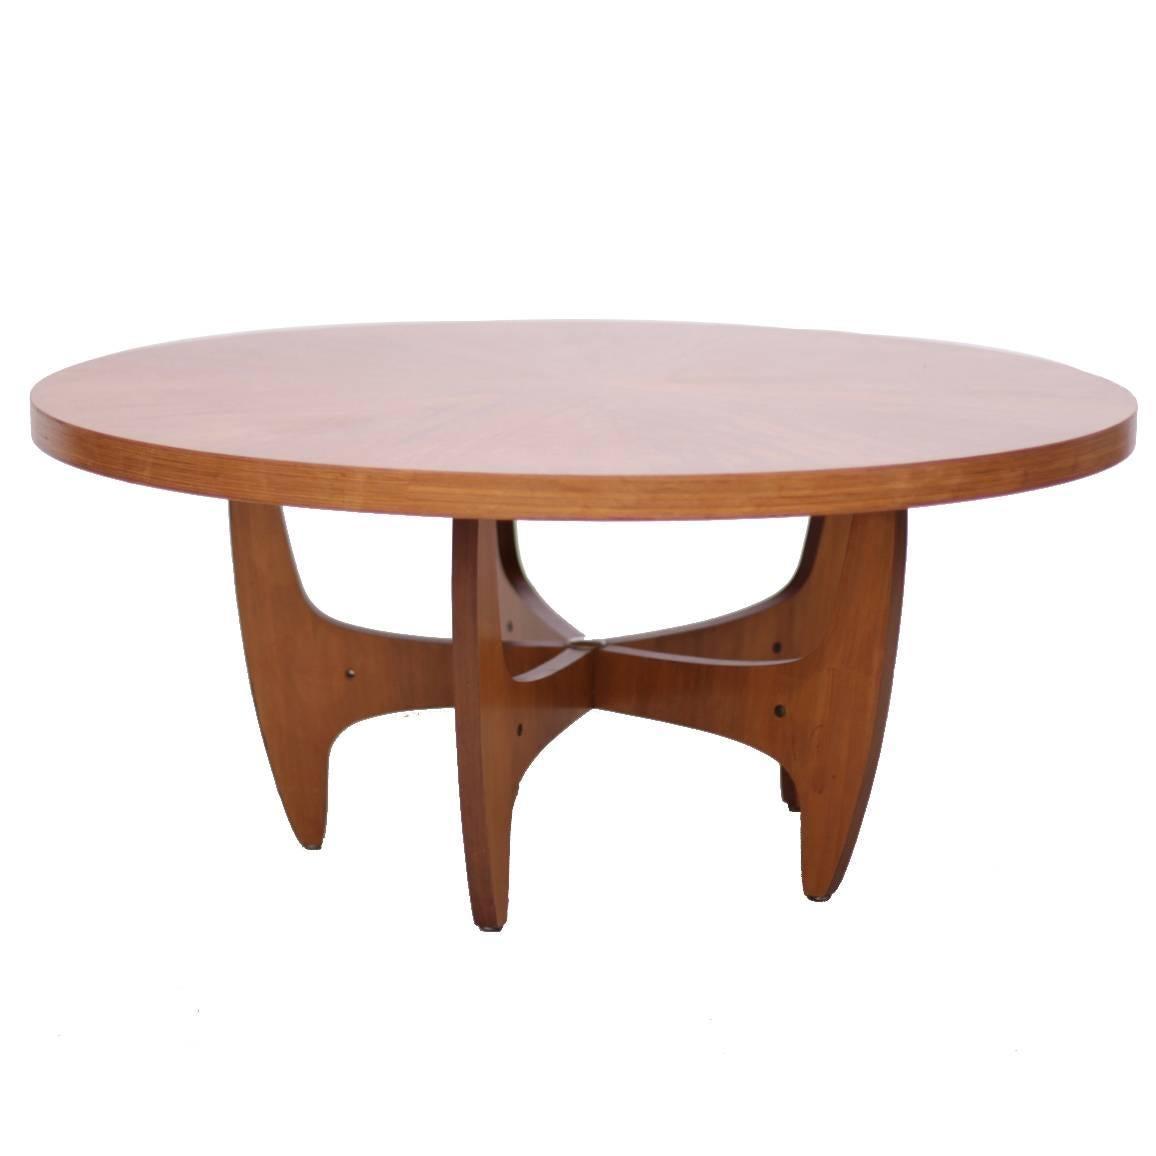 Danish 1960s Teak Coffee Table